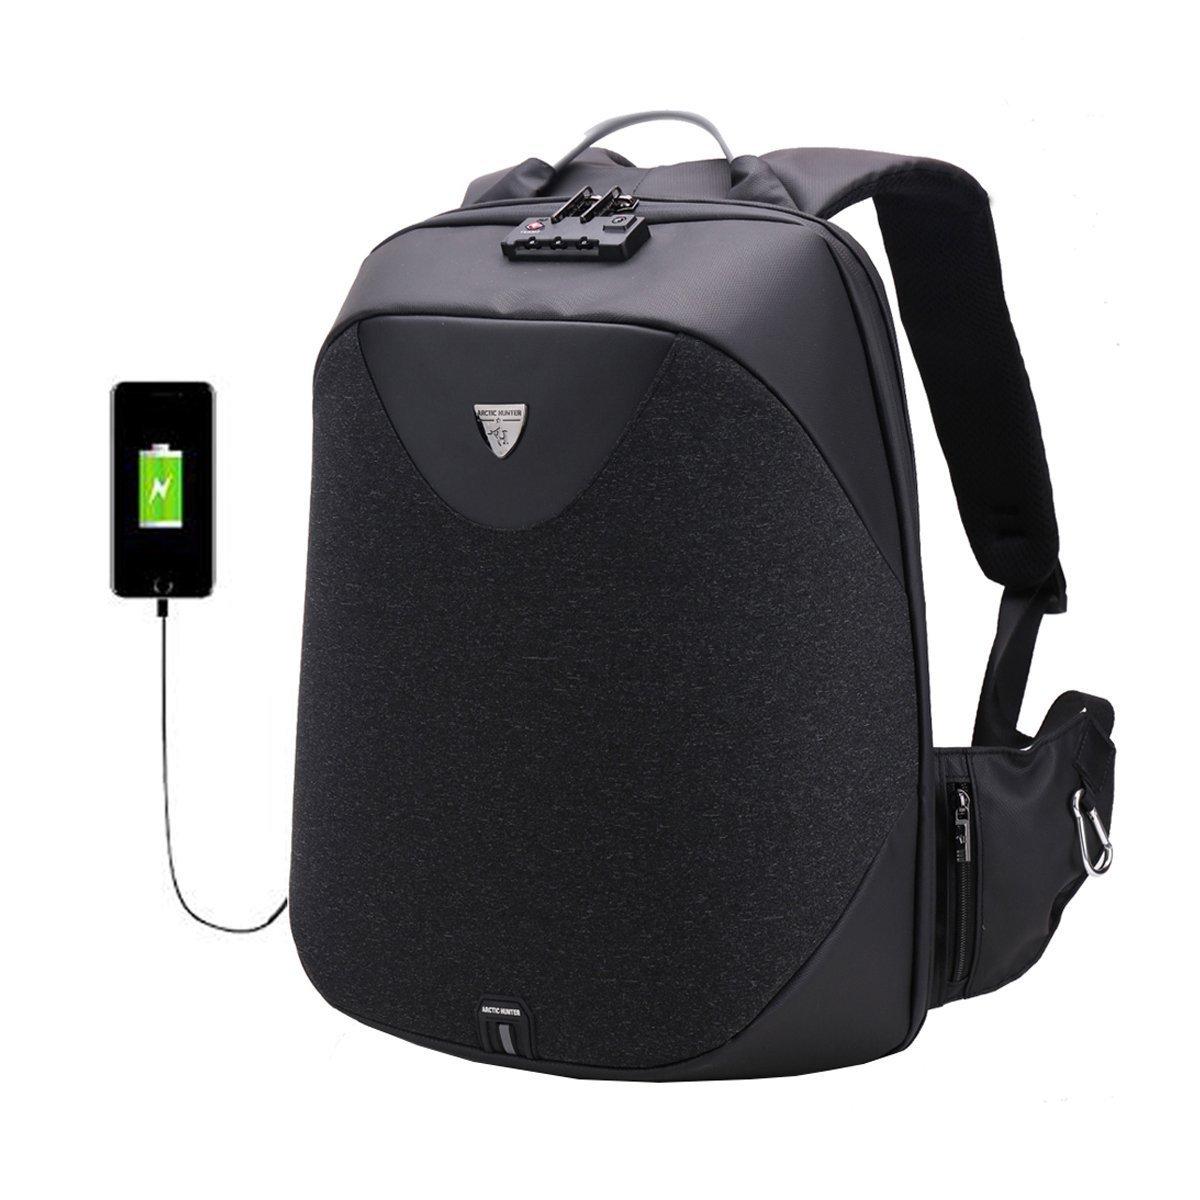 School 15.6 Laptop backpack men Waterproof Mochila Casual Travel Business USB Back pack Male Bag Anti-theft Gift (black)